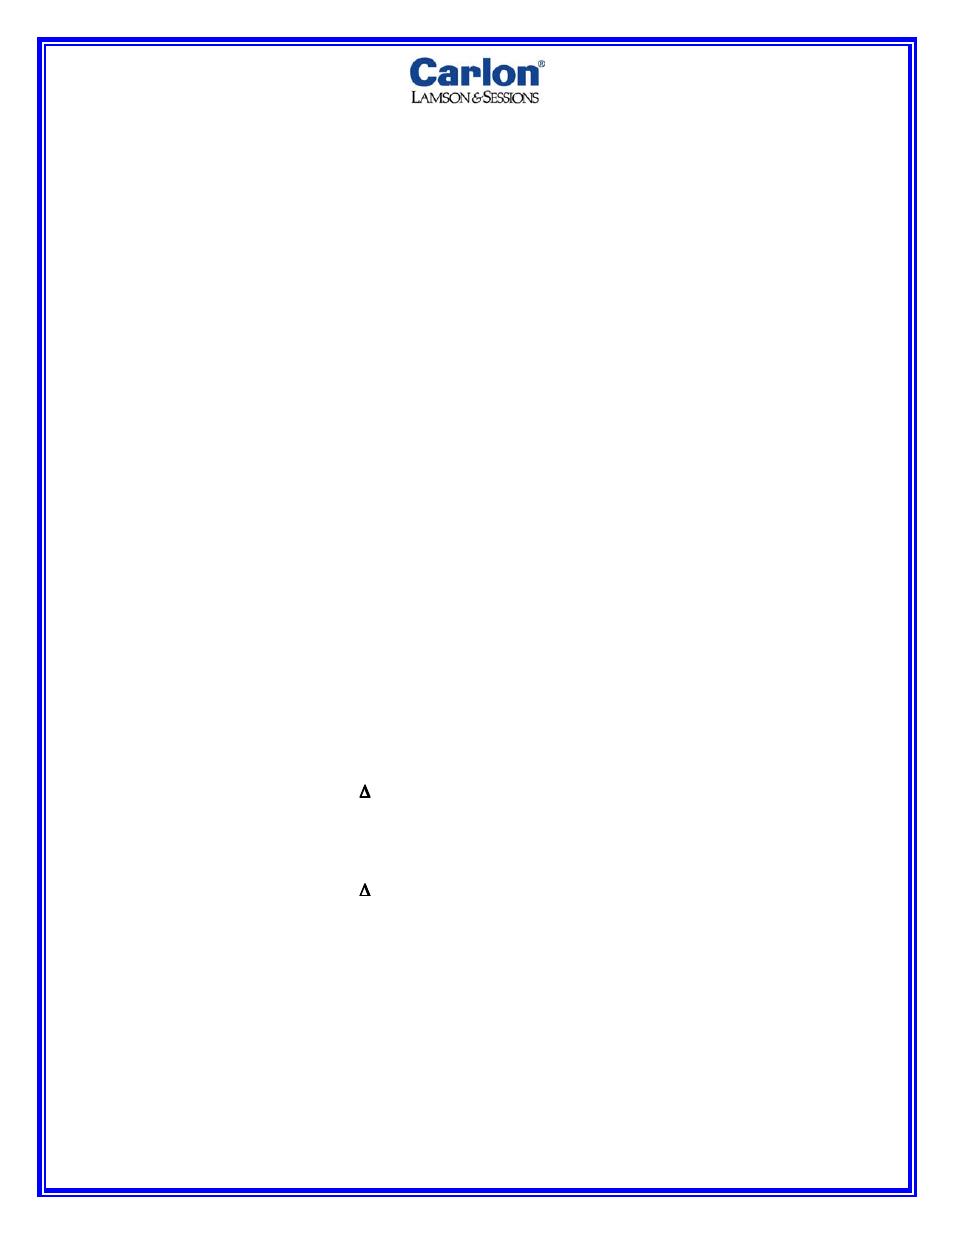 Carlon External Load Calculation for Buried Conduit User Manual | 7